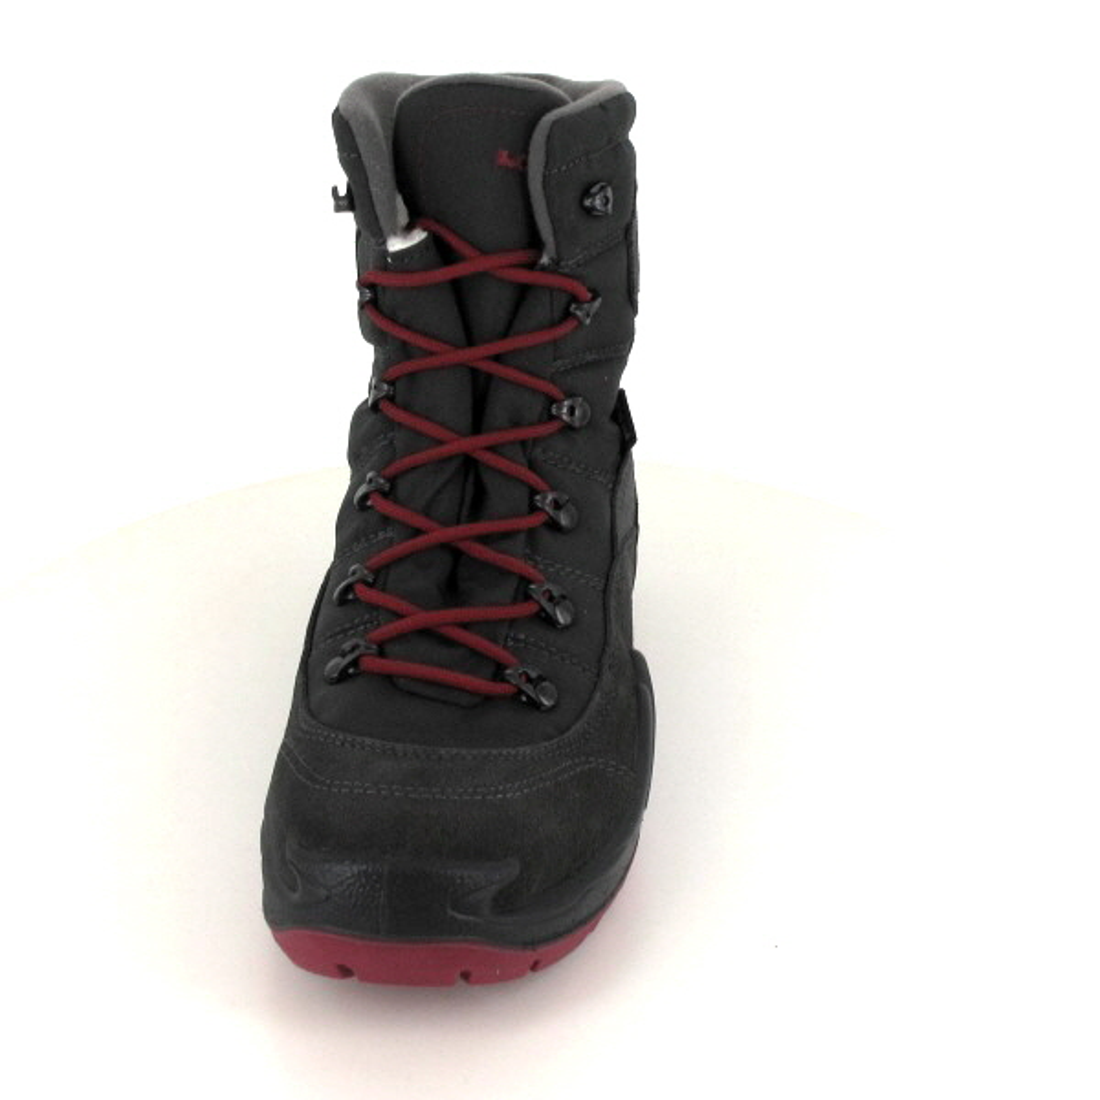 sneakers sneakers for cheap quality Lowa RUFUS III GTX HI | Schuh-Welt - Wo Markenschuhe günstig ...